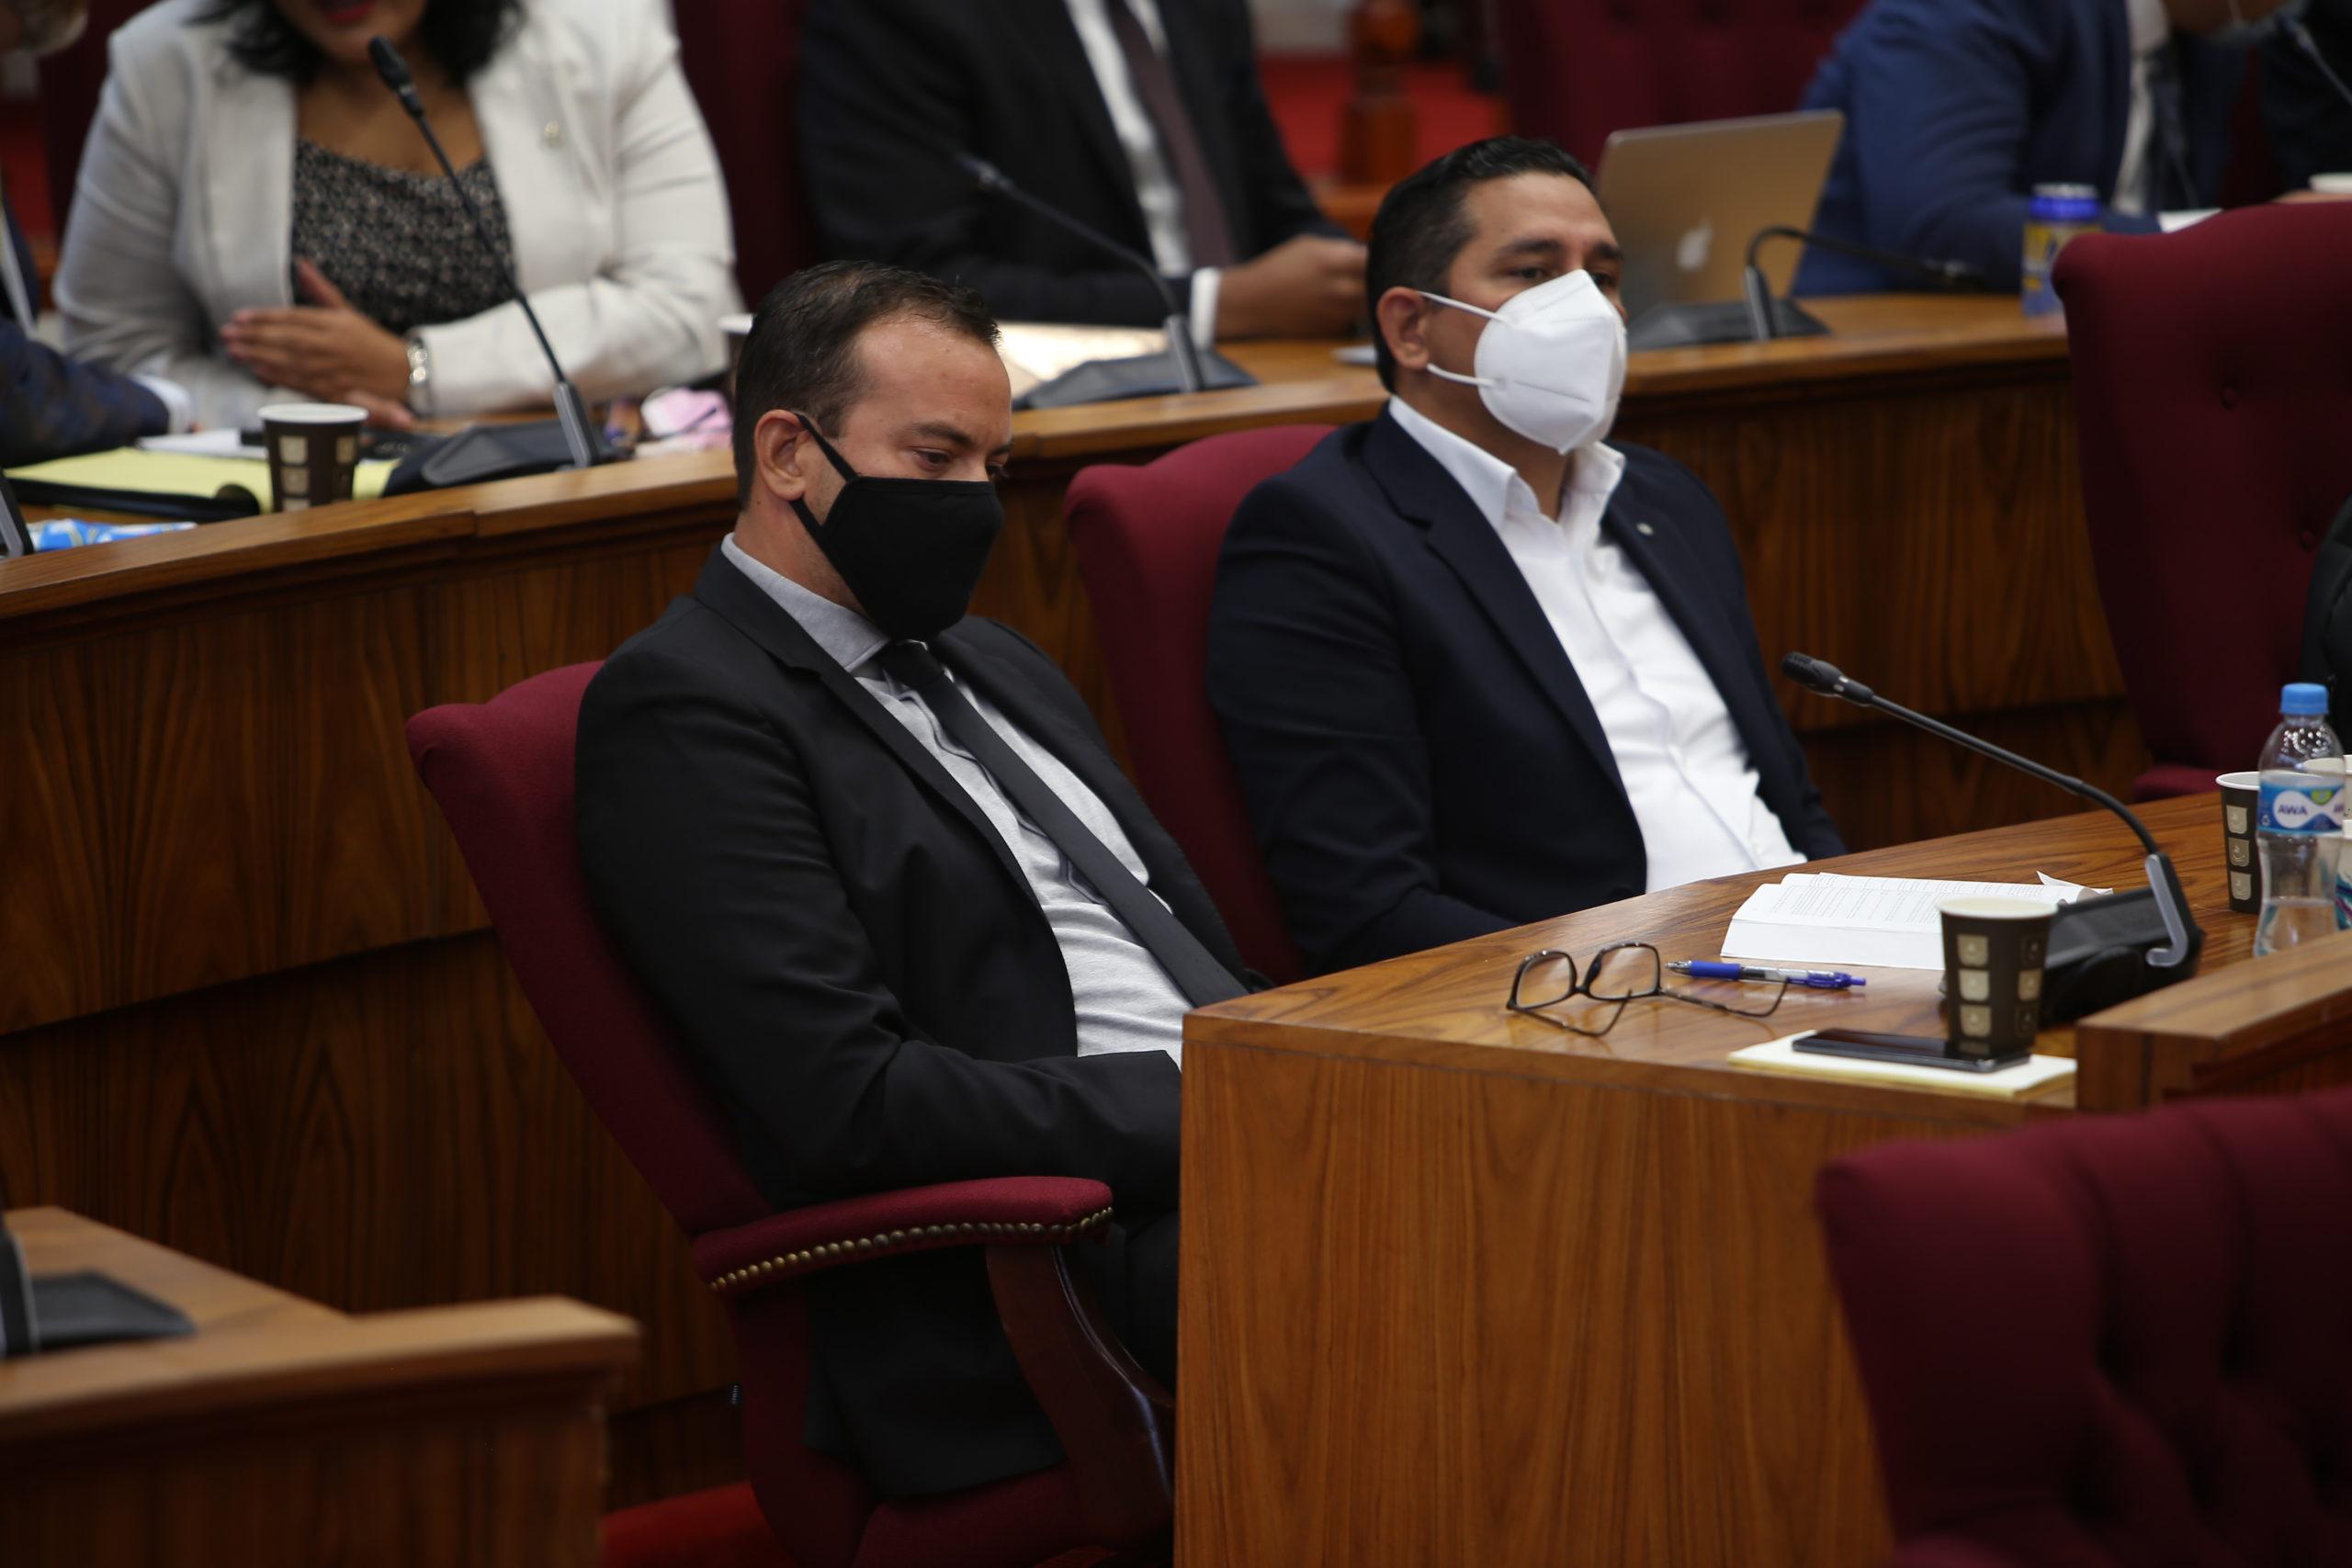 RAIZ cla pa sirbi pais: Prome den parlamento awo como minister